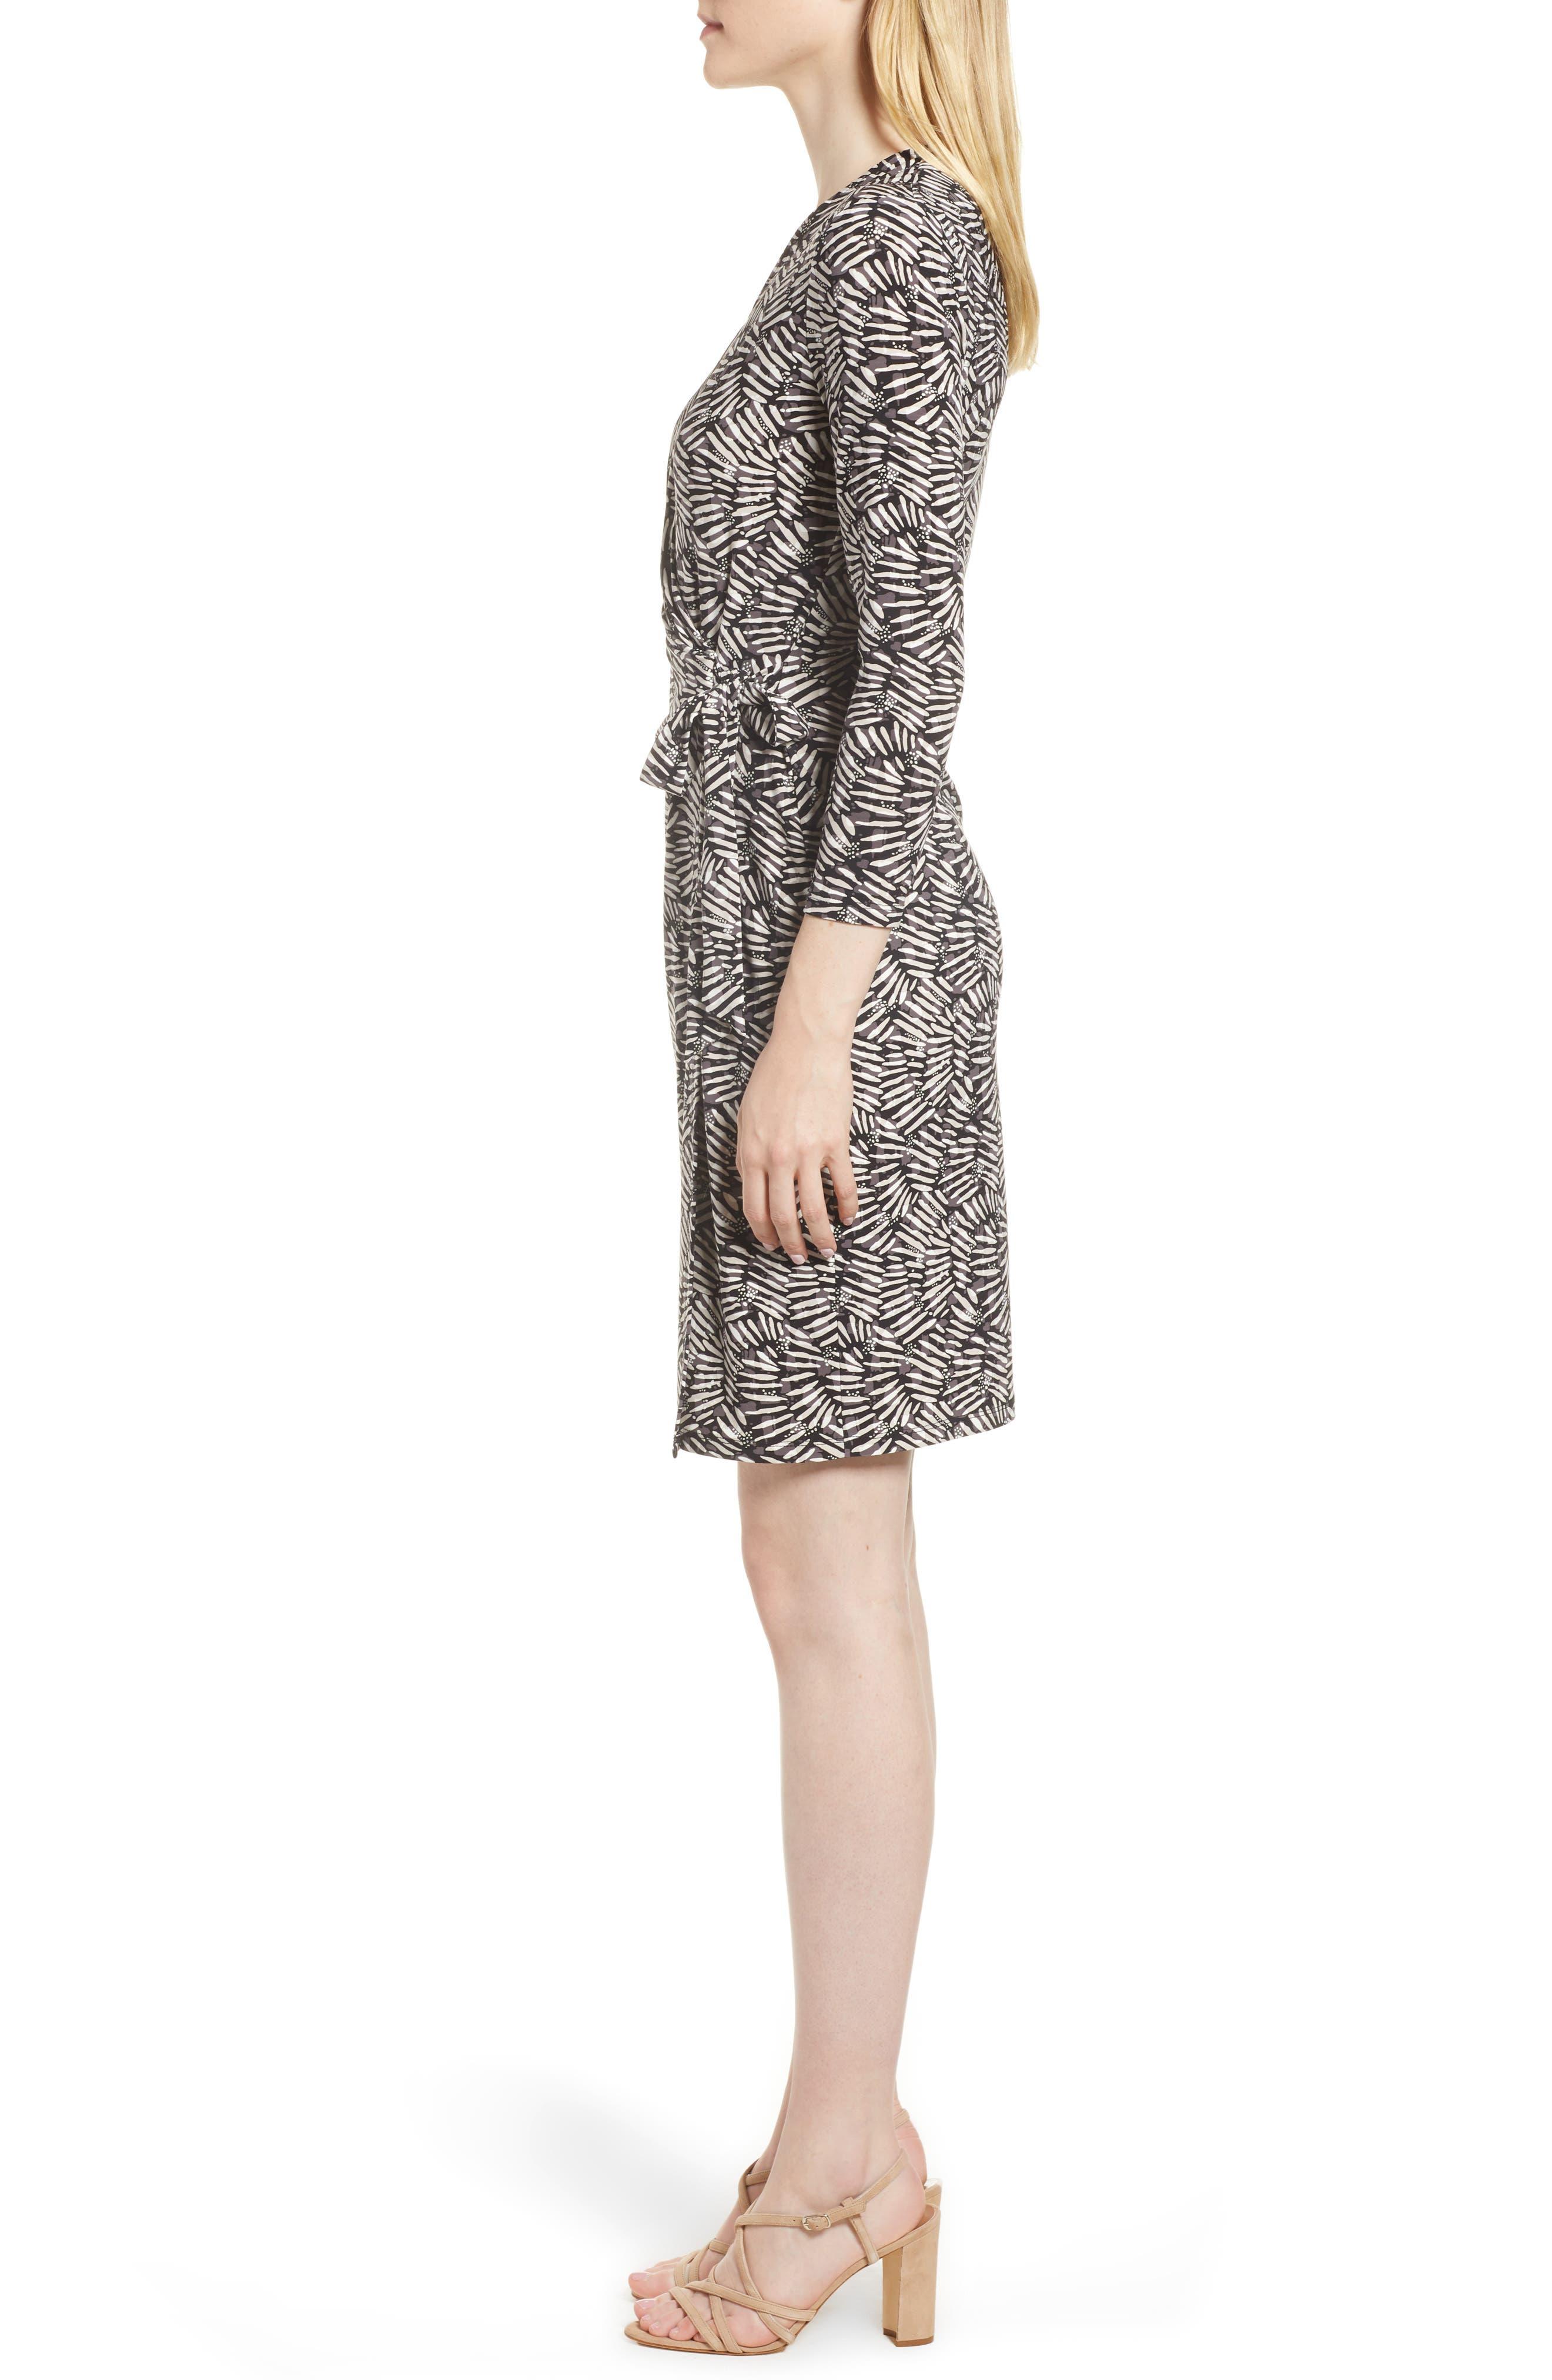 Cedarwood Stretch Crepe Faux Wrap Dress,                             Alternate thumbnail 3, color,                             Black/ Oyster Shell Combo